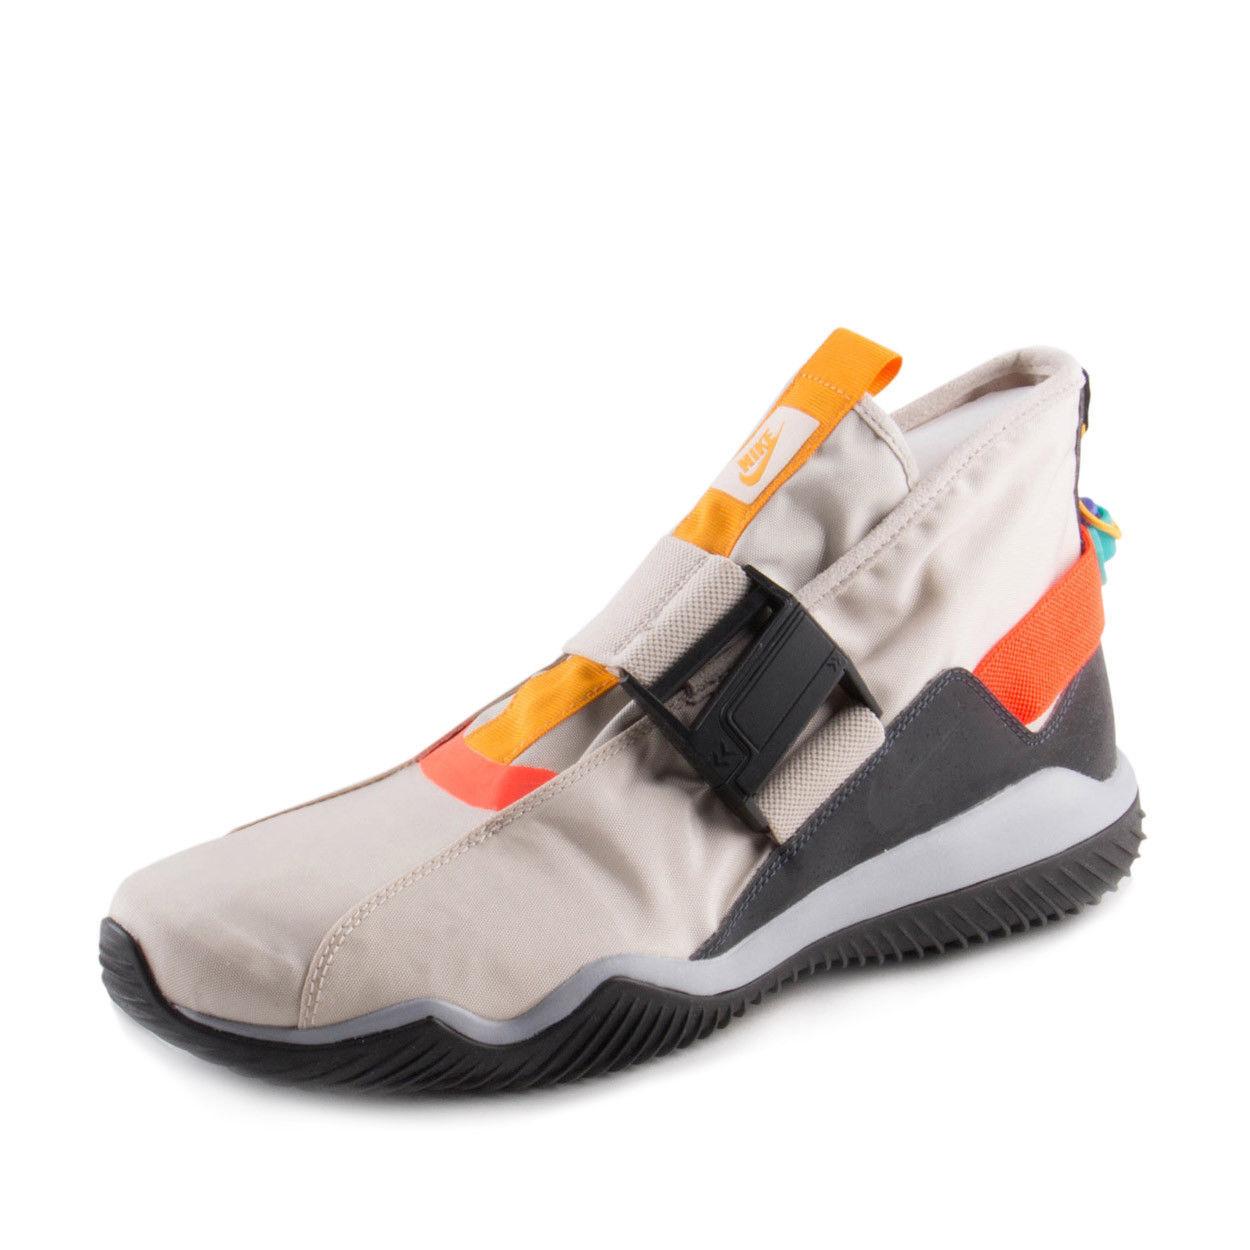 Nike Men's KMTR Komyuter SE Birch Black Shadow Brown sz 9 [AA0531 200]